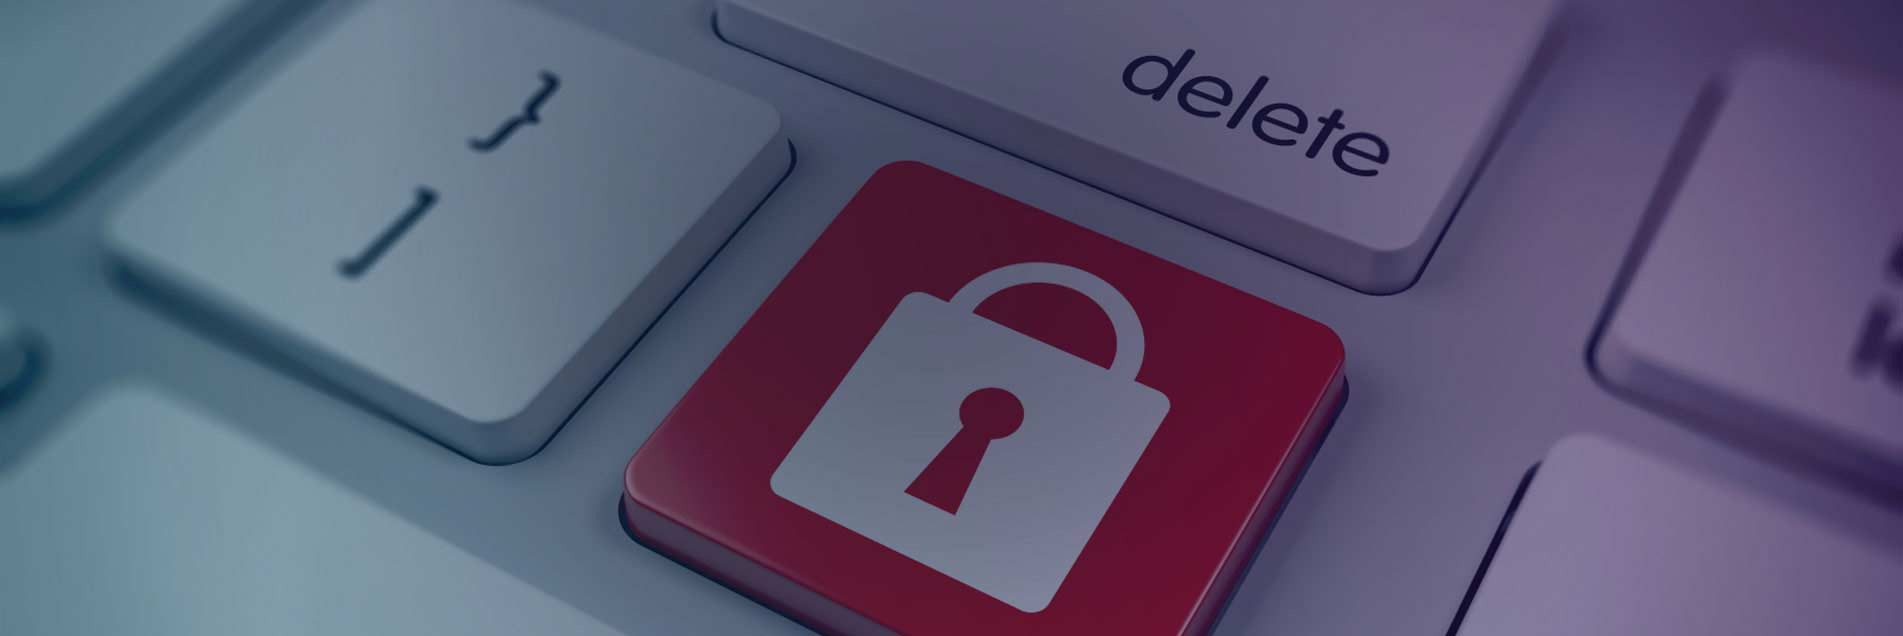 Proteja seu site com SSL